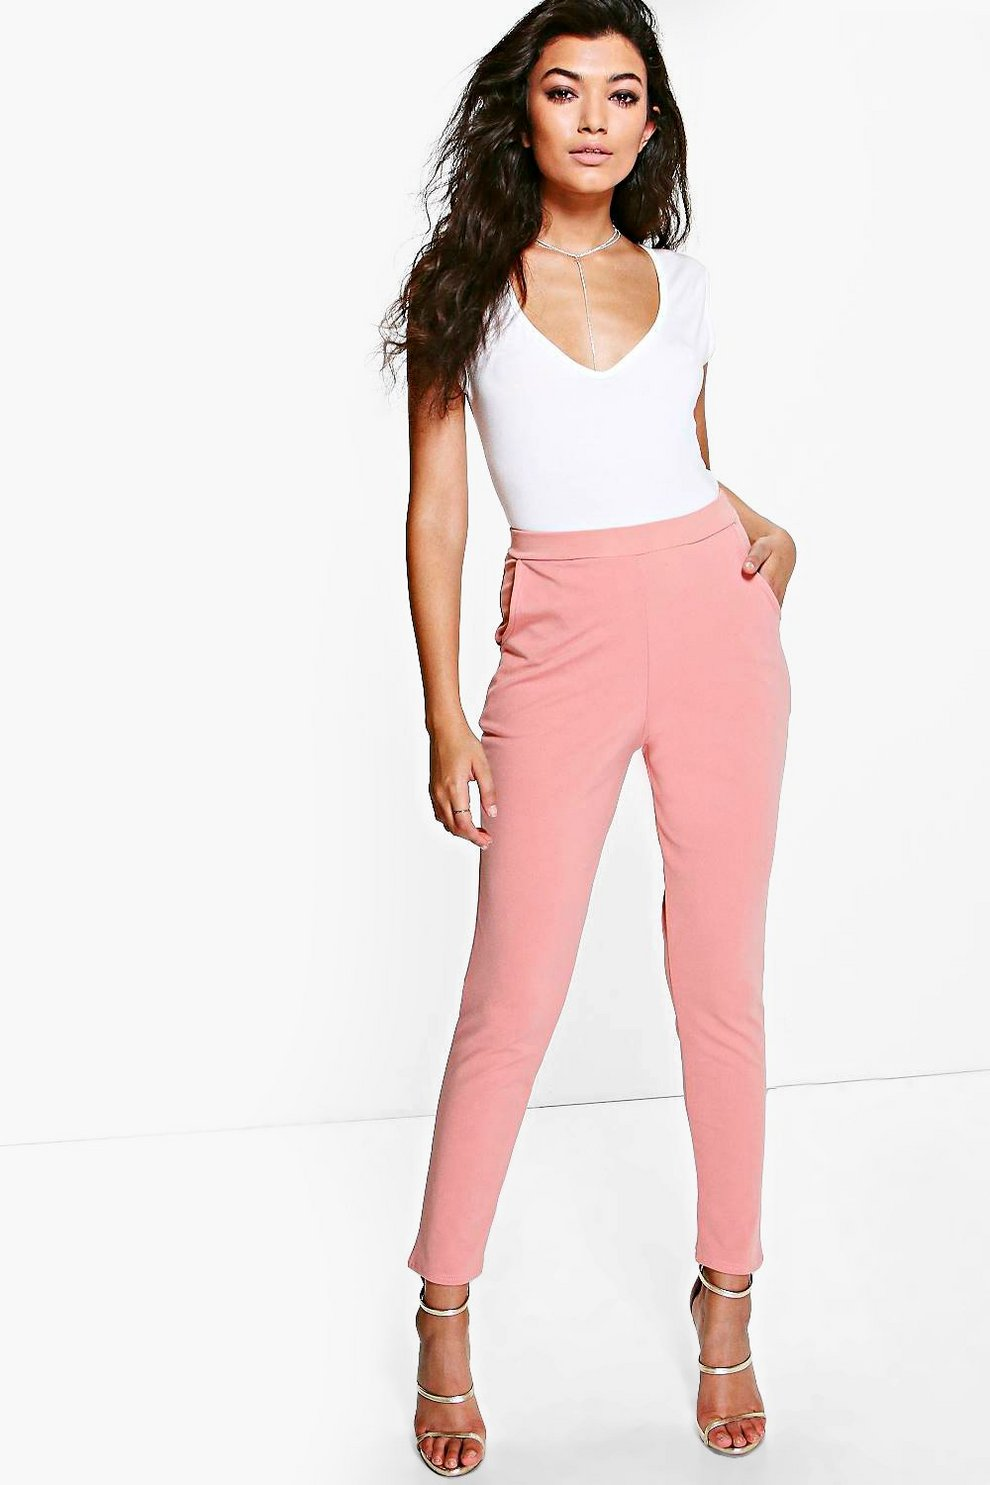 caccd27c5cd2a Womens Coral Basic Scuba Super Stretch Skinny Trousers